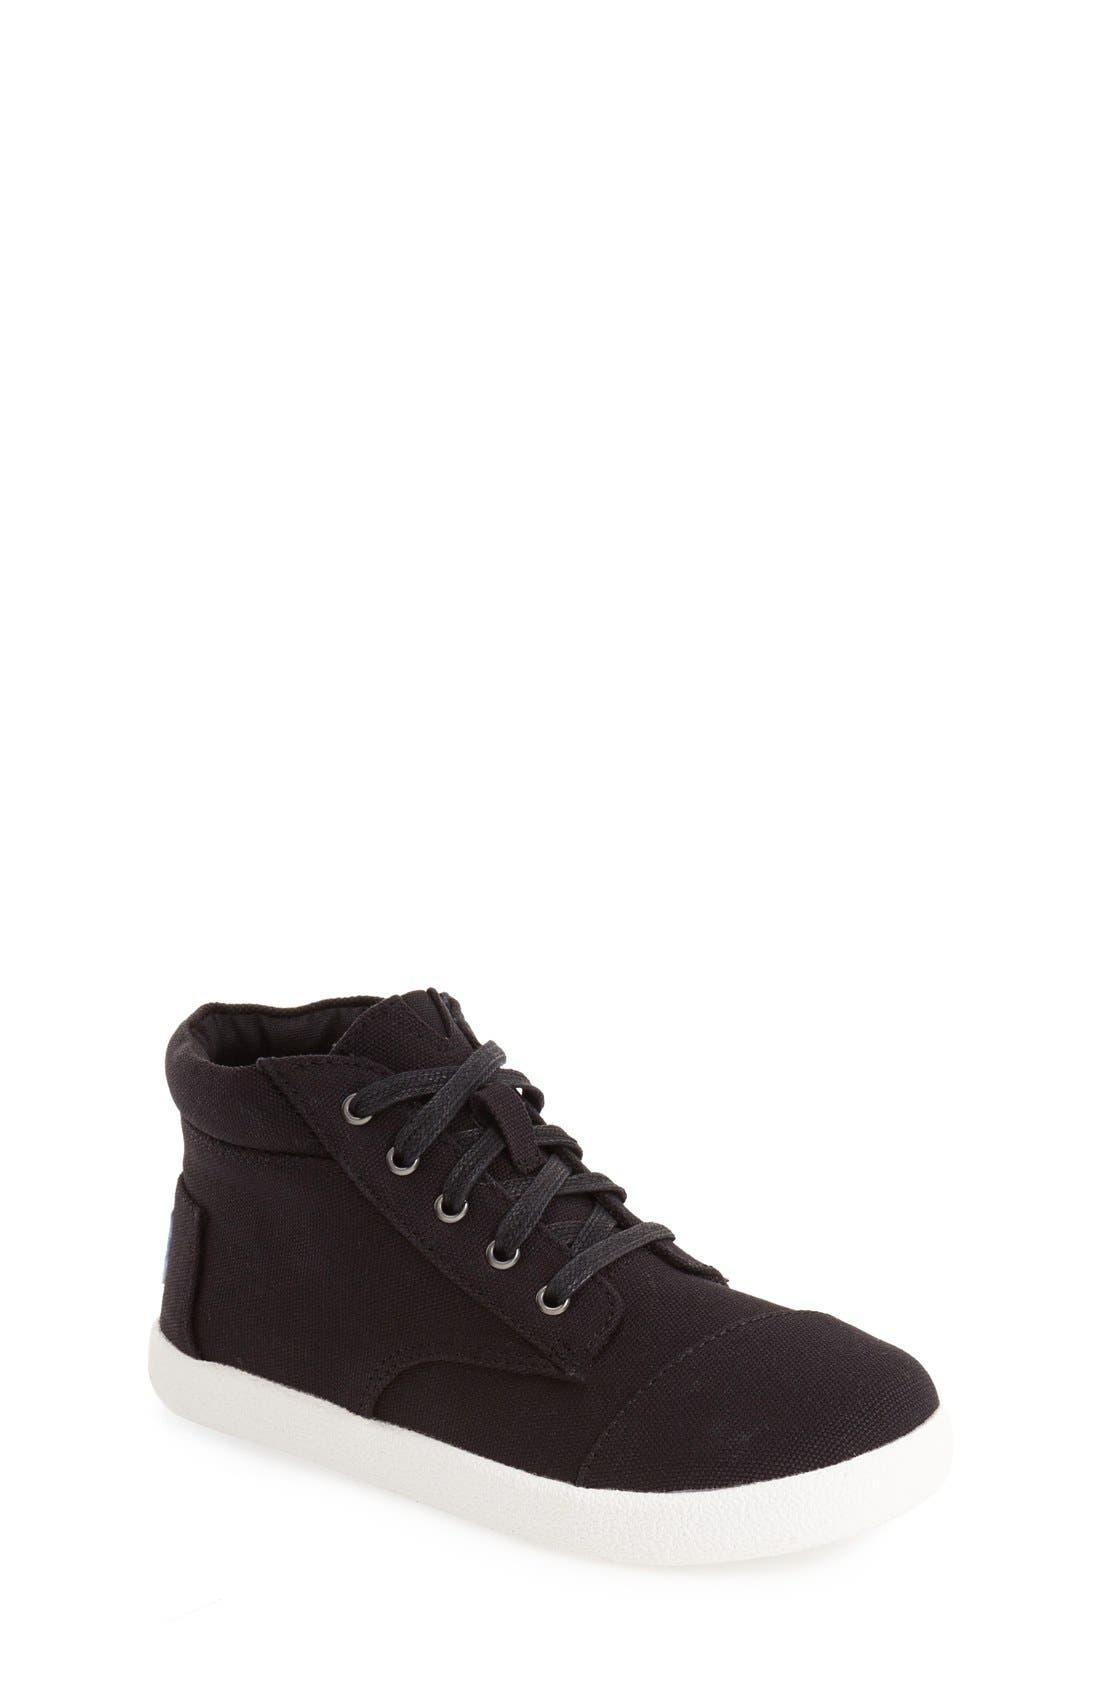 'Paseo' High Top Sneaker,                             Main thumbnail 1, color,                             BLACK